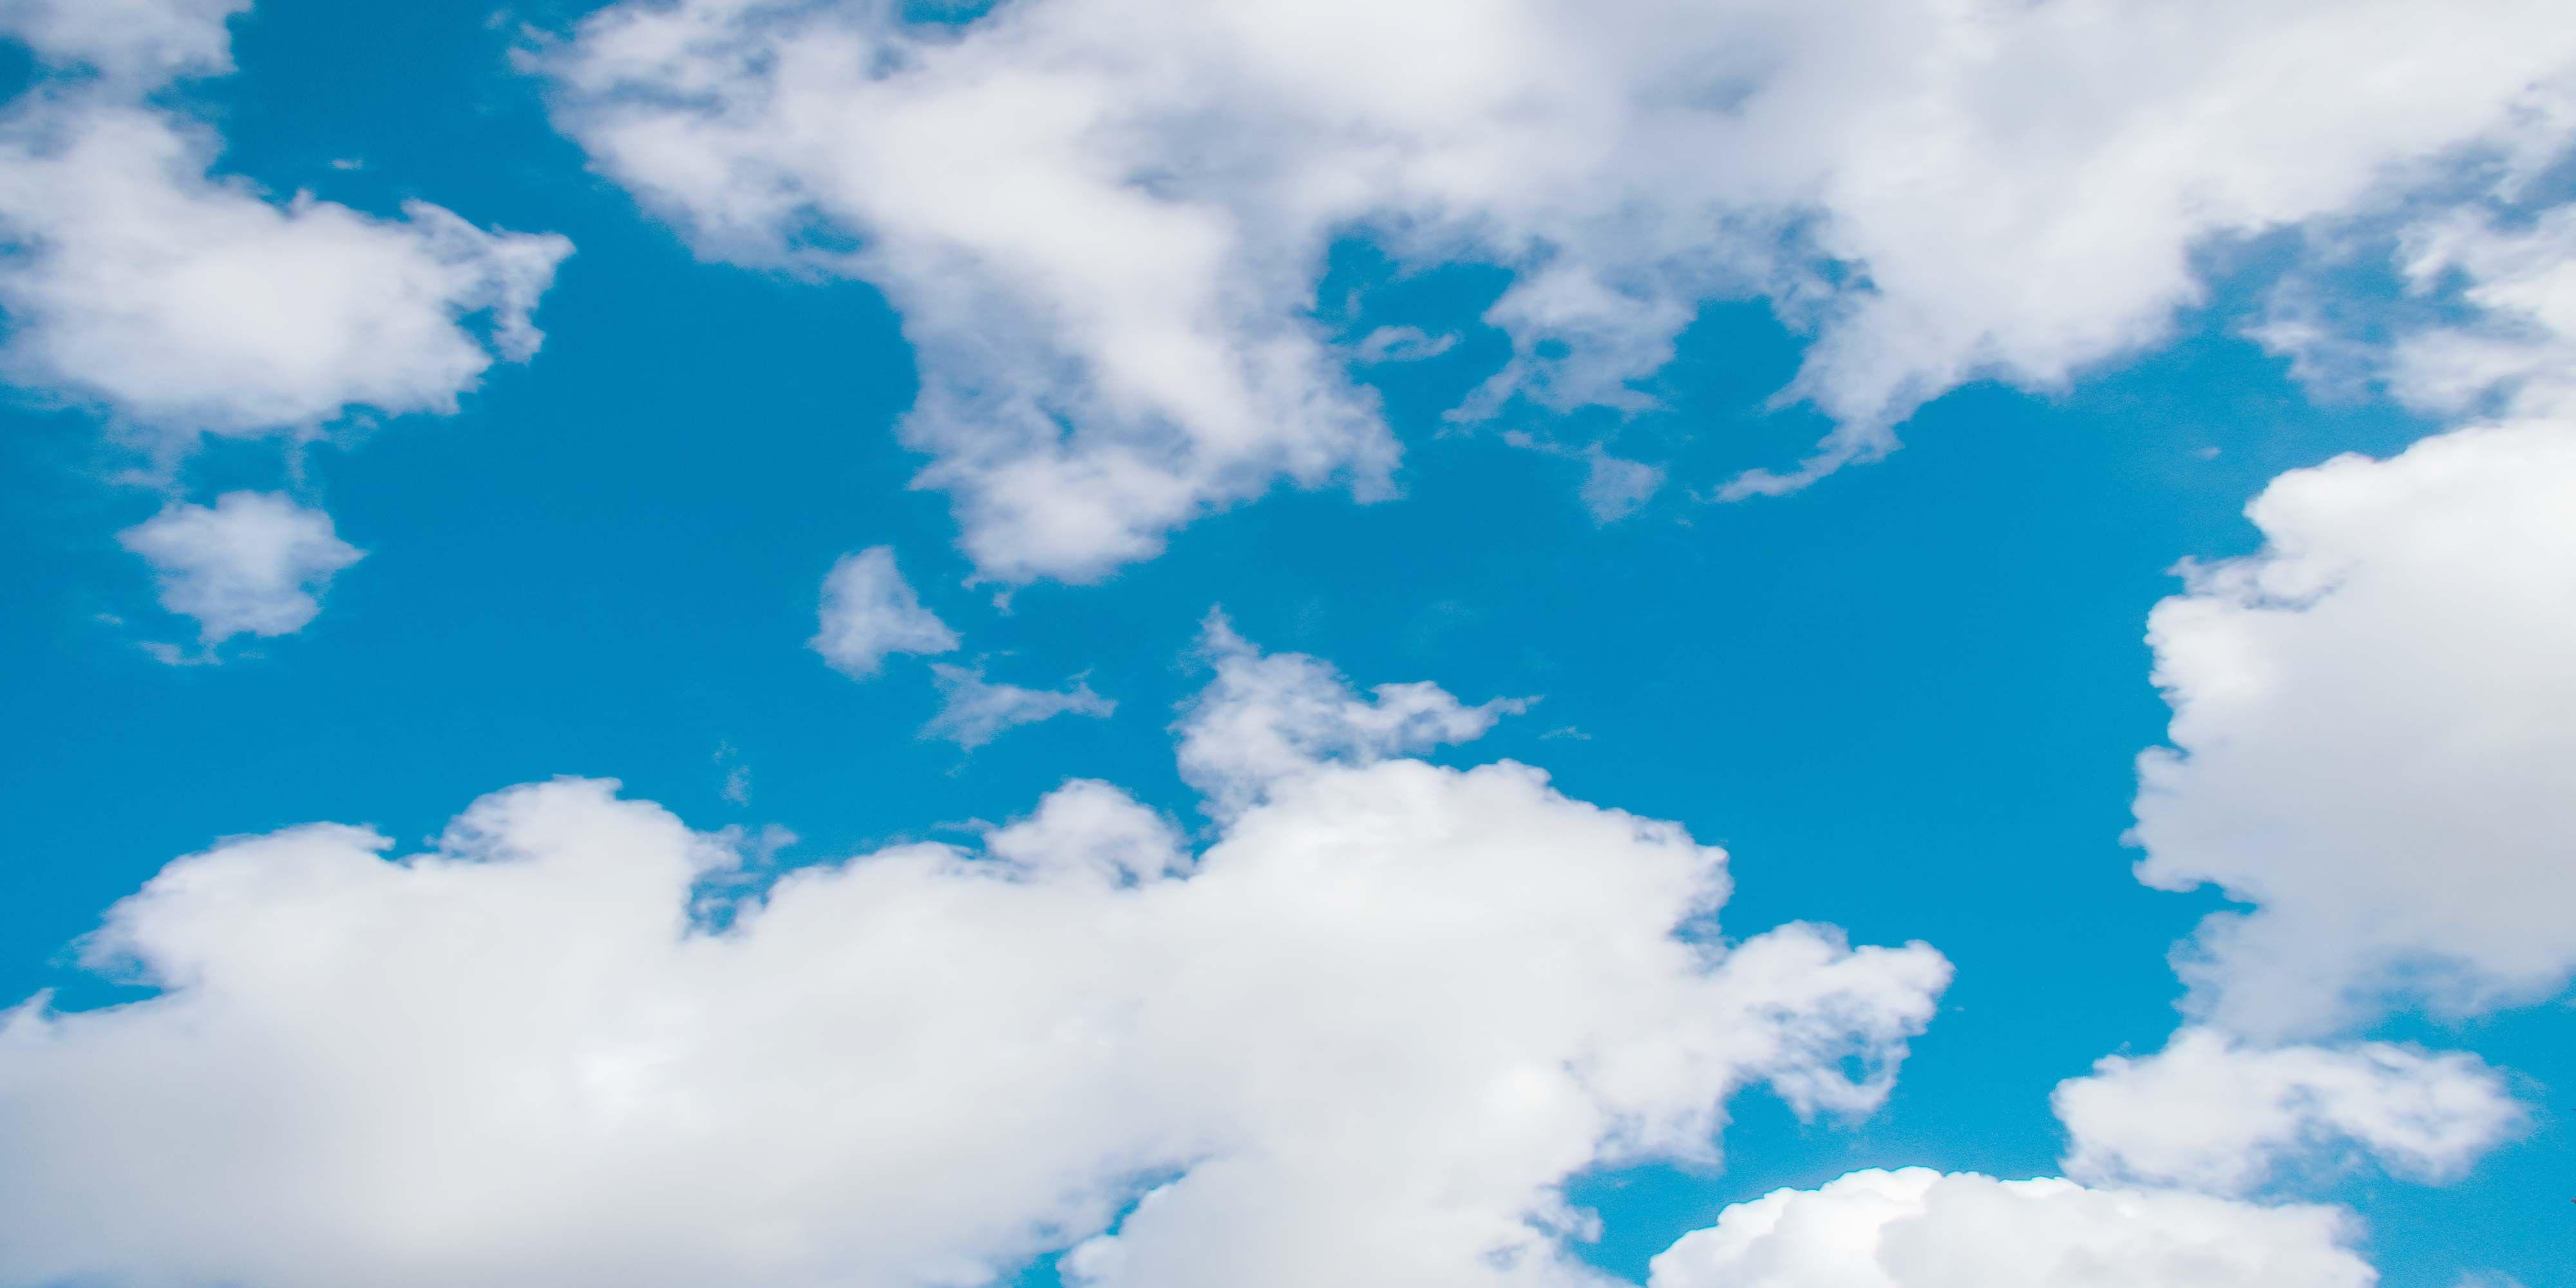 Ultra HD Wallpaper, flower 4K Cloud Wallpaper Божье